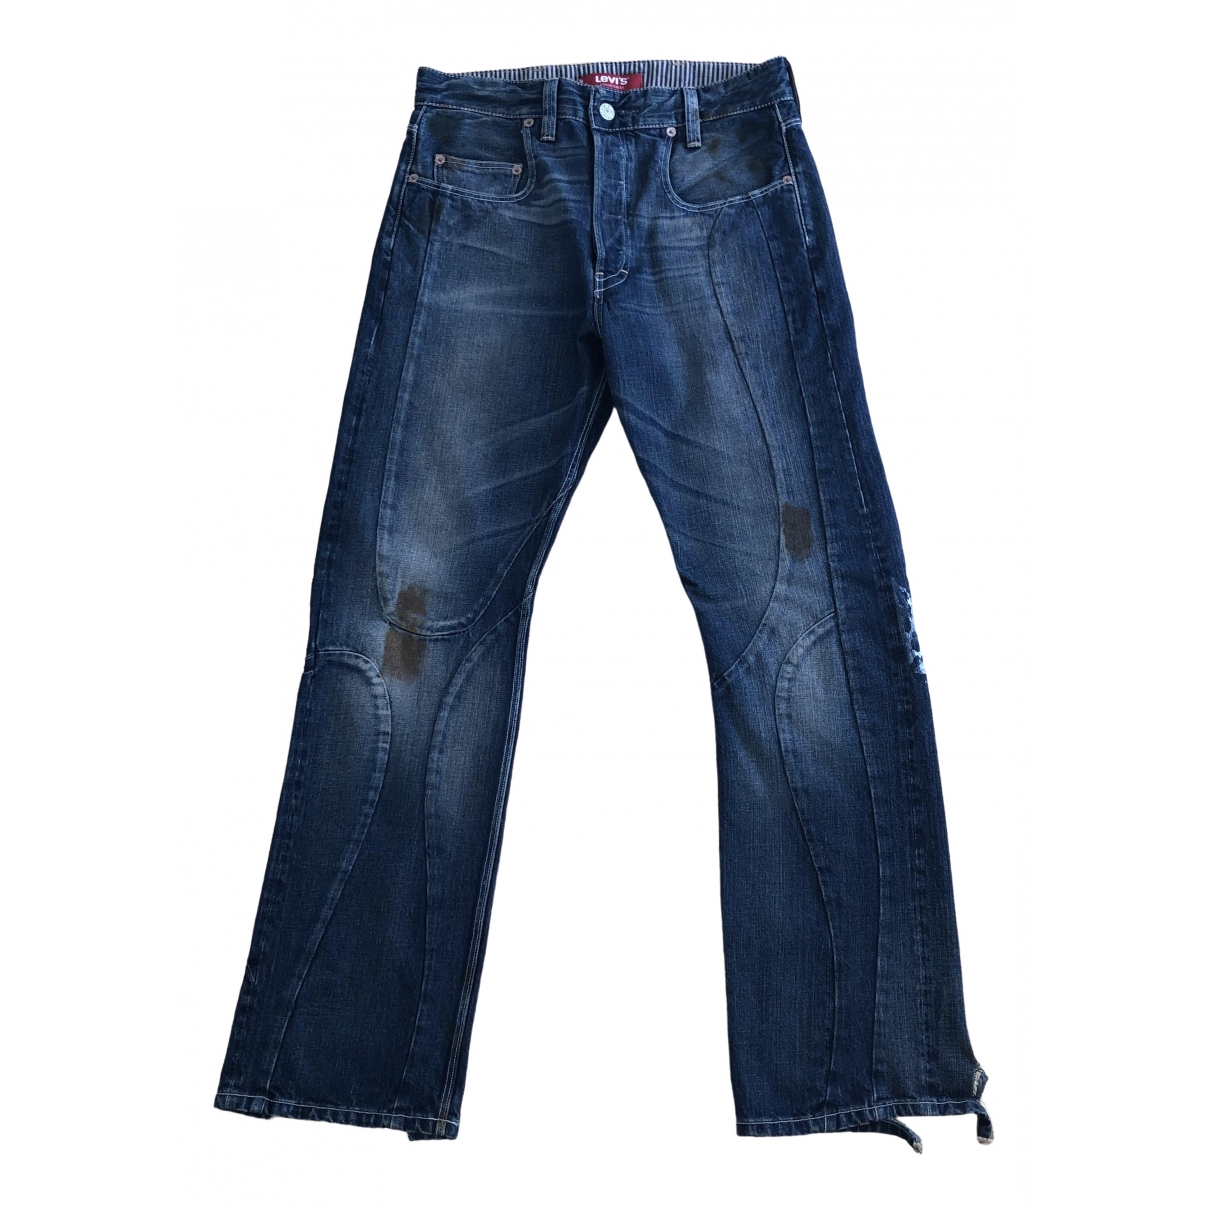 Levi's Vintage Clothing \N Blue Denim - Jeans Trousers for Men 32 UK - US